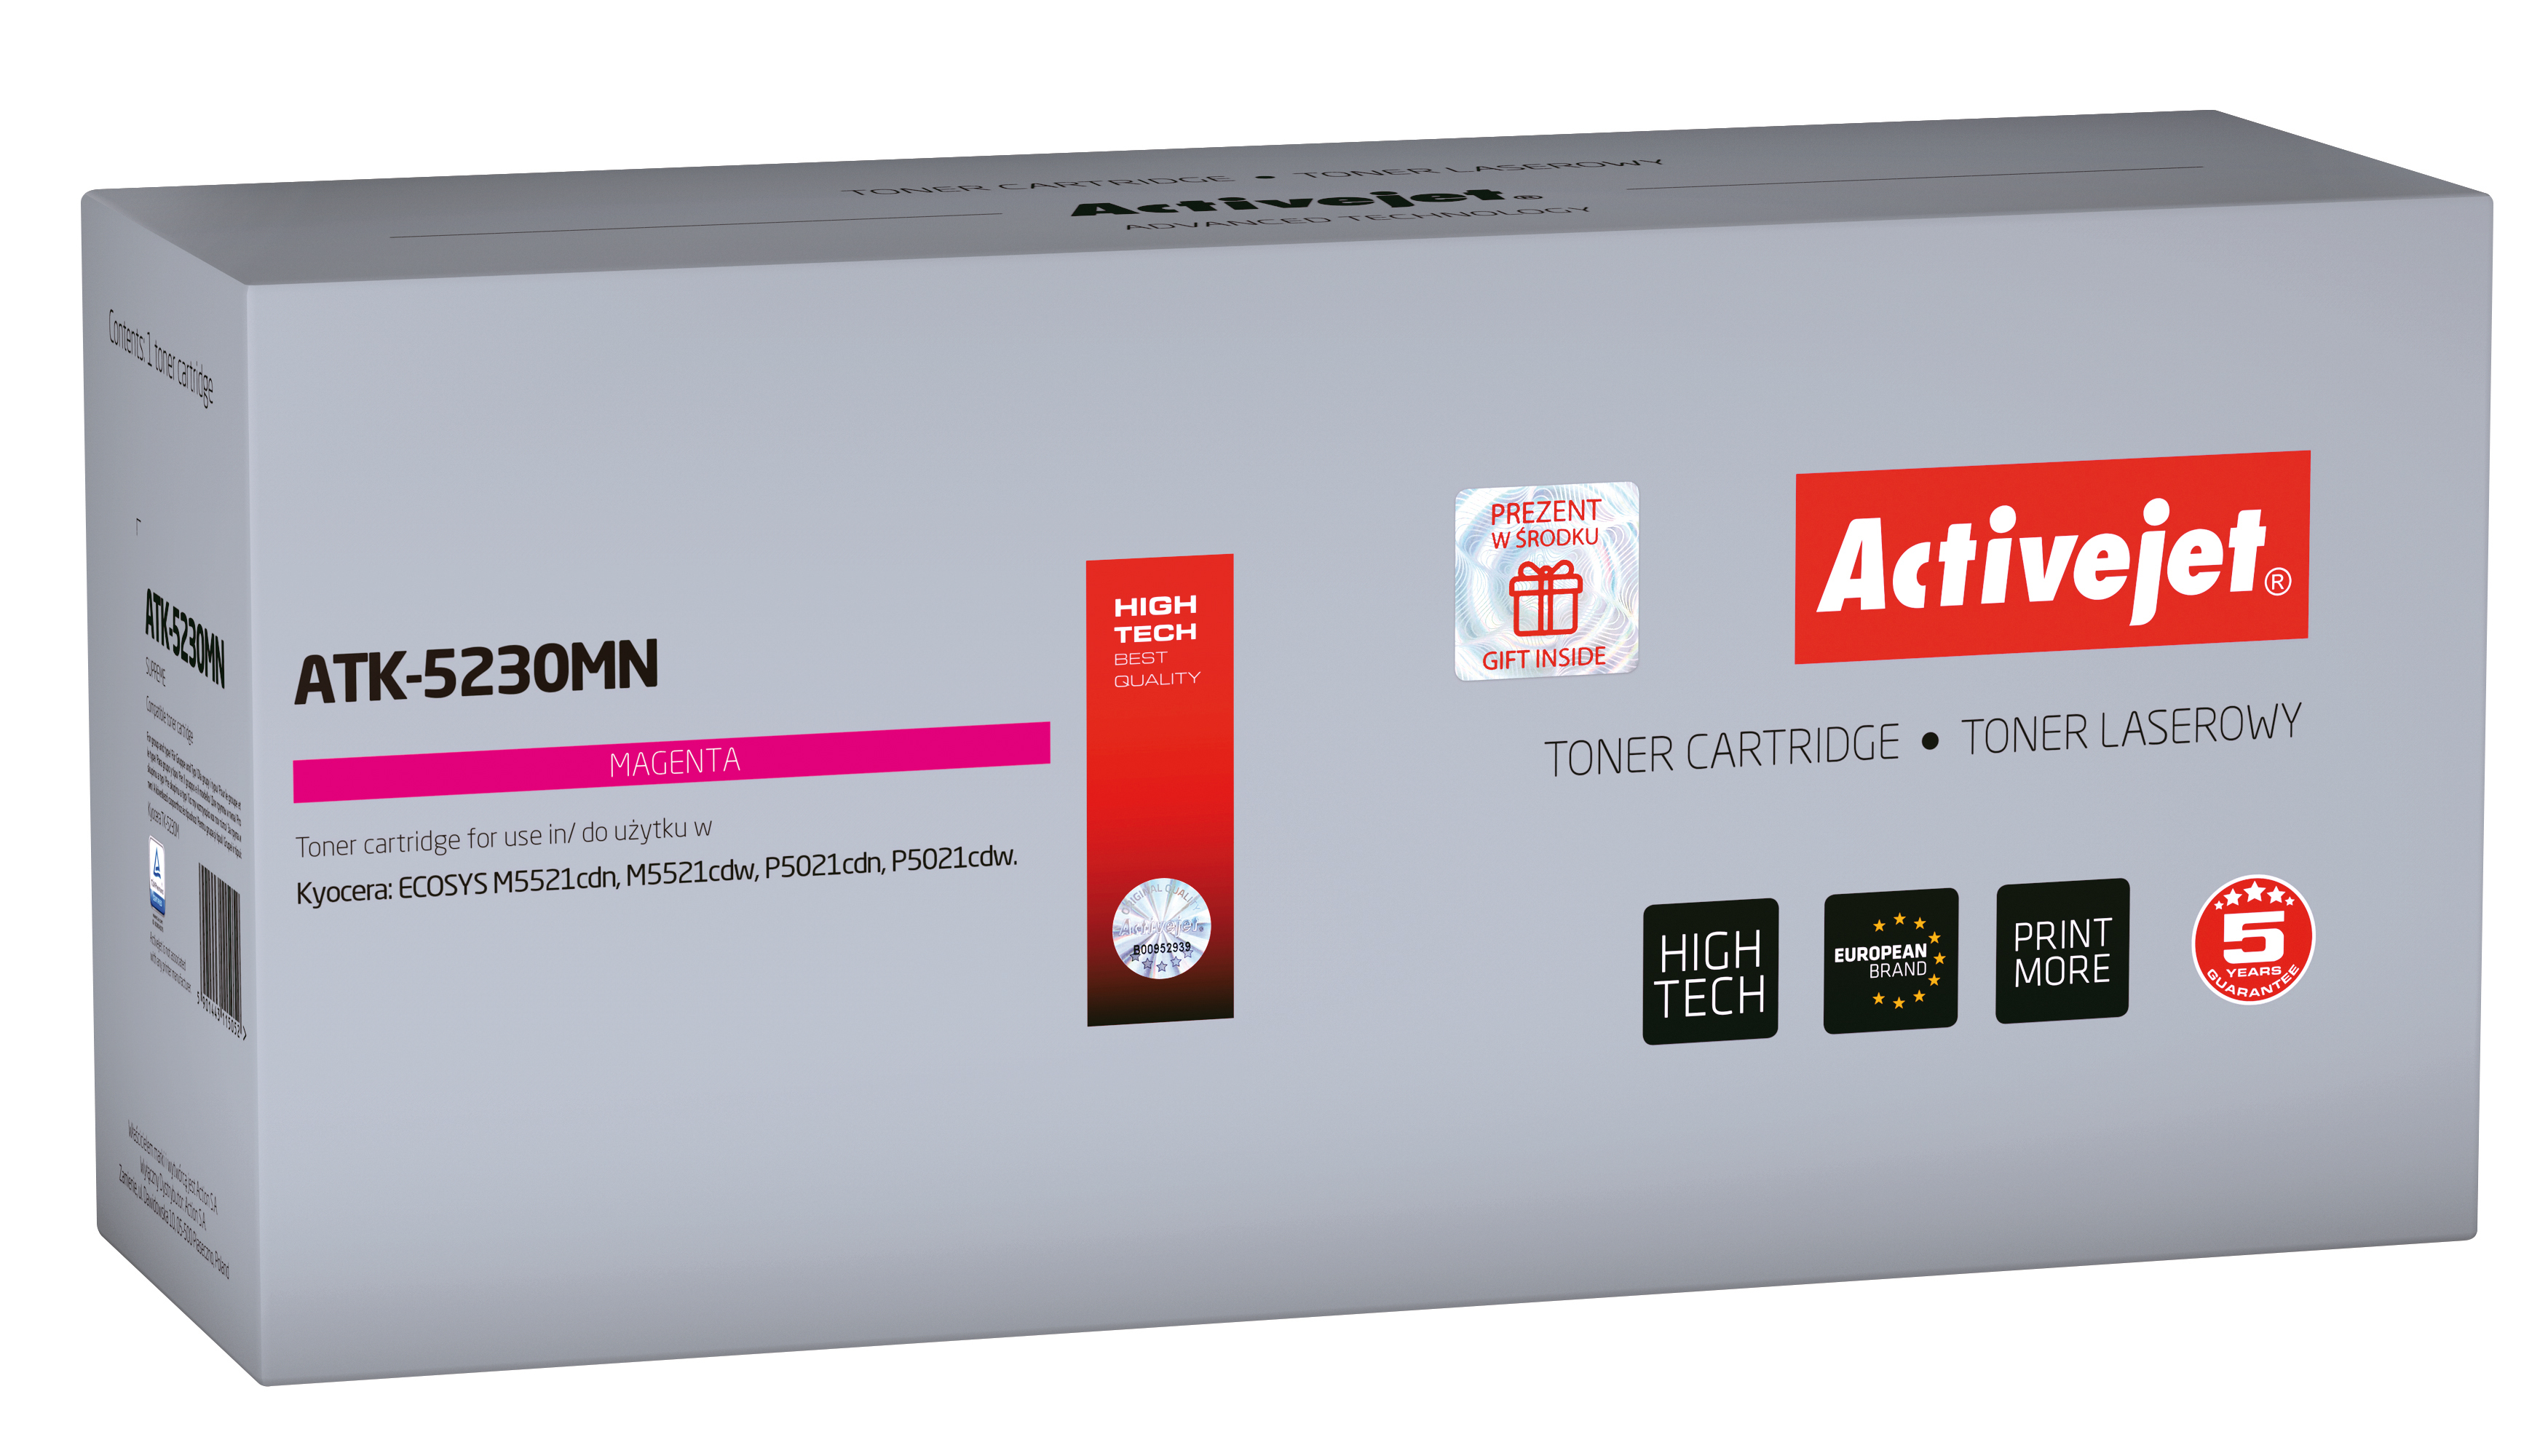 Toner Activejet  ATK-5230MN do drukarki Kyocera, Zamiennik Kyocera TK-5230M; Supreme; 2200 stron; Purpurowy.